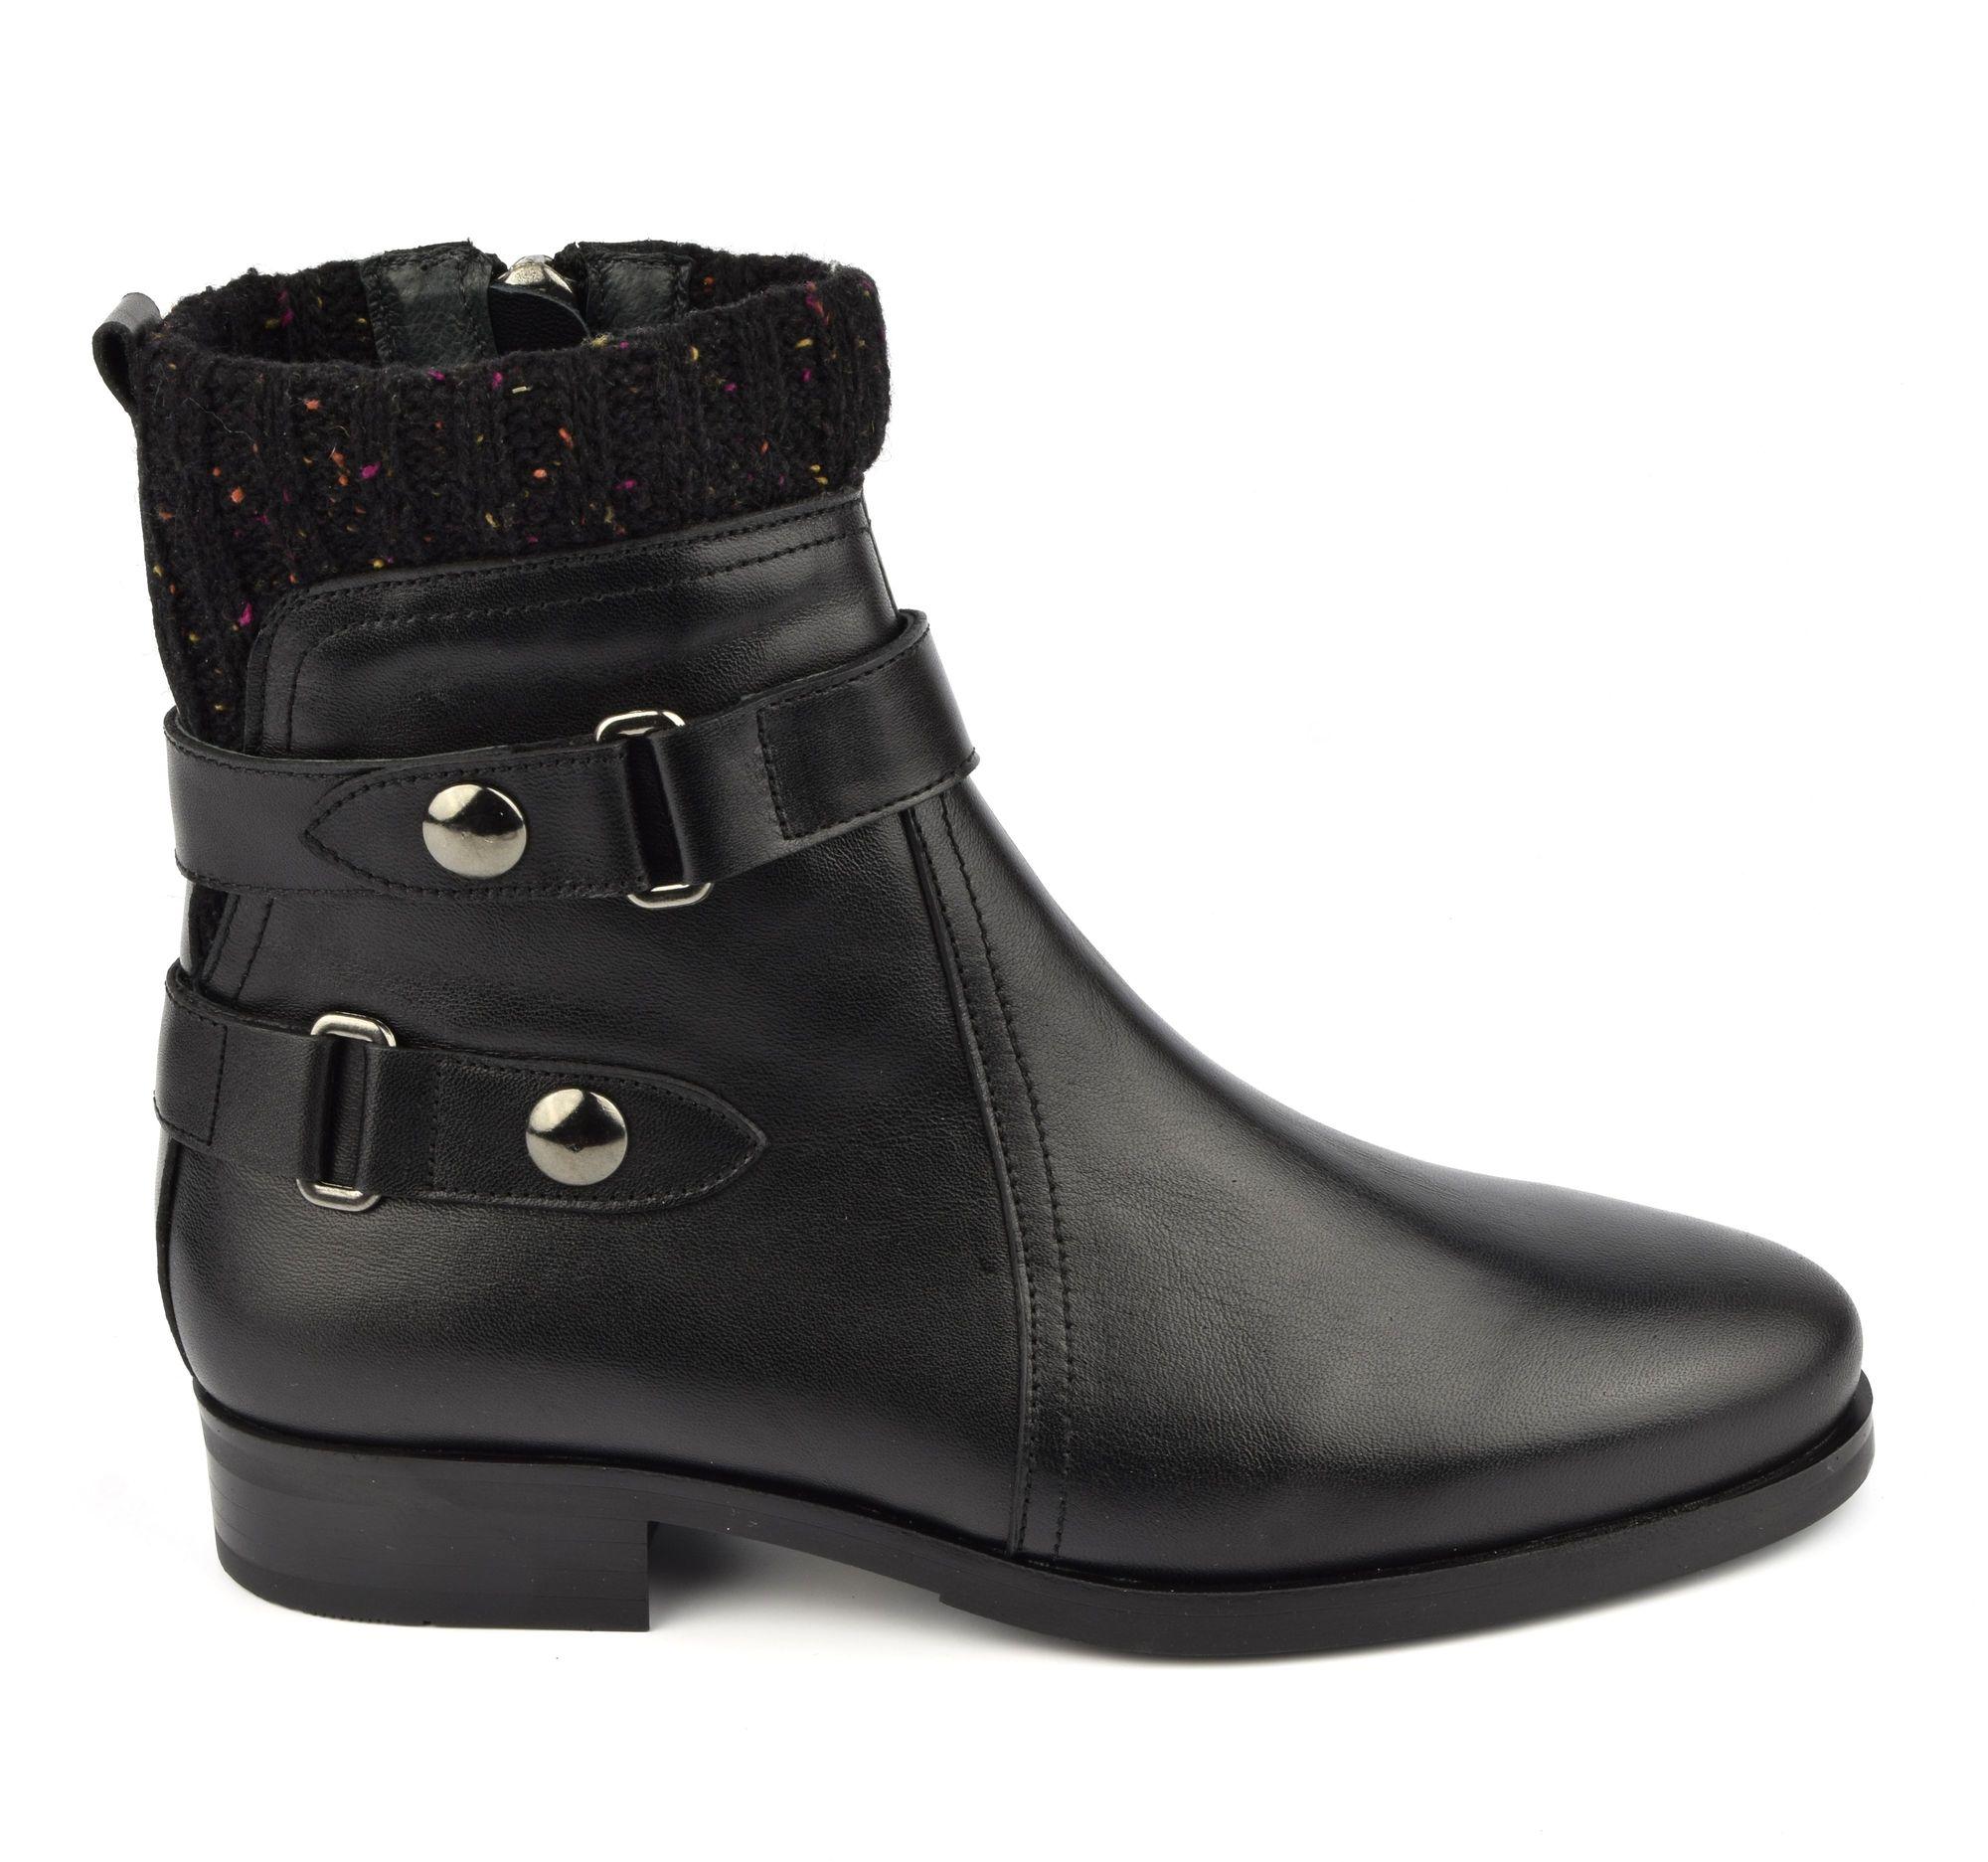 chaussure femme petite pointure